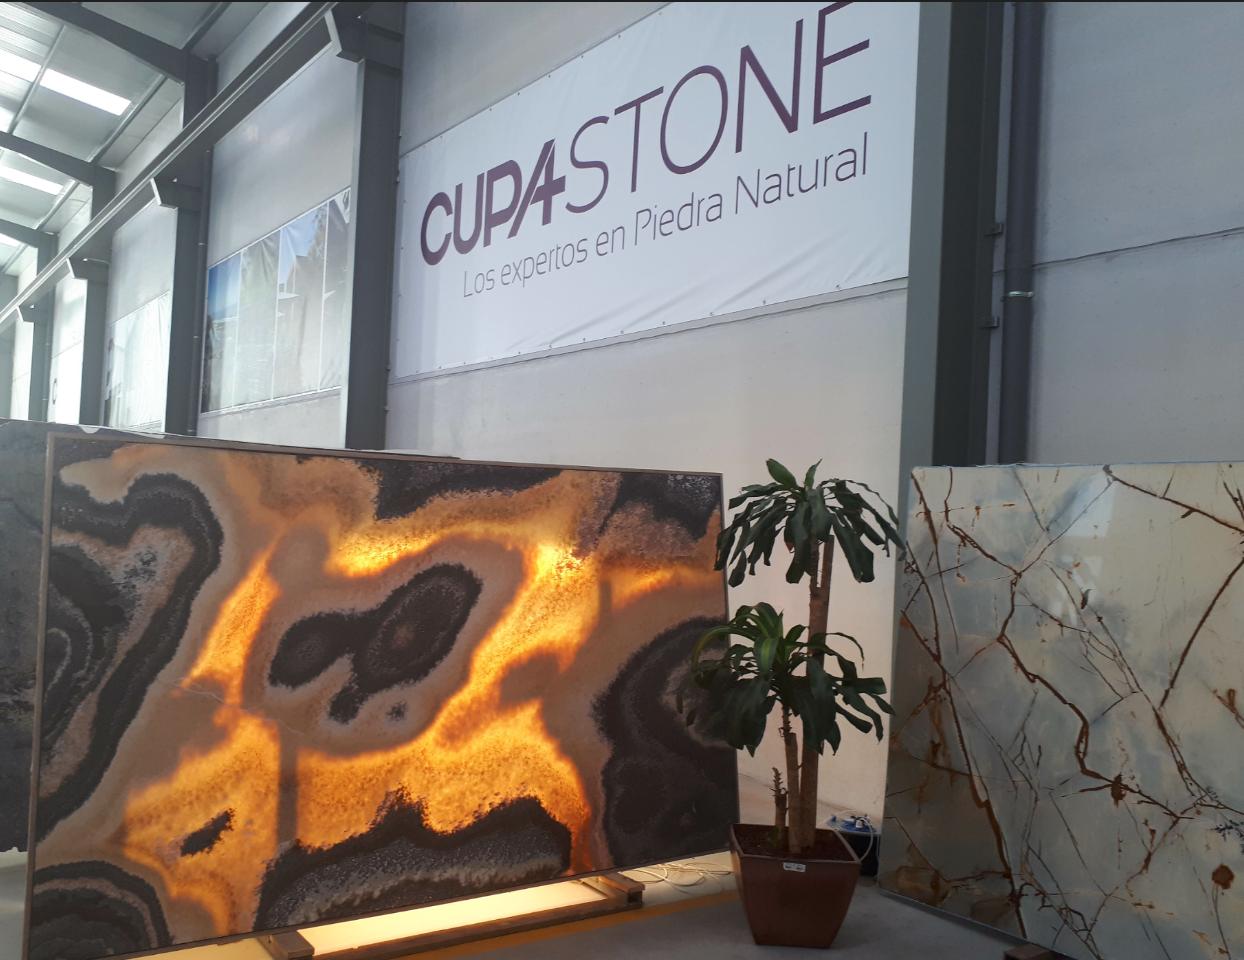 Cupa Stone Santiago Ofrece Una Extensa Oferta De Piedra Natural  # Muebles Sequeira Plasencia